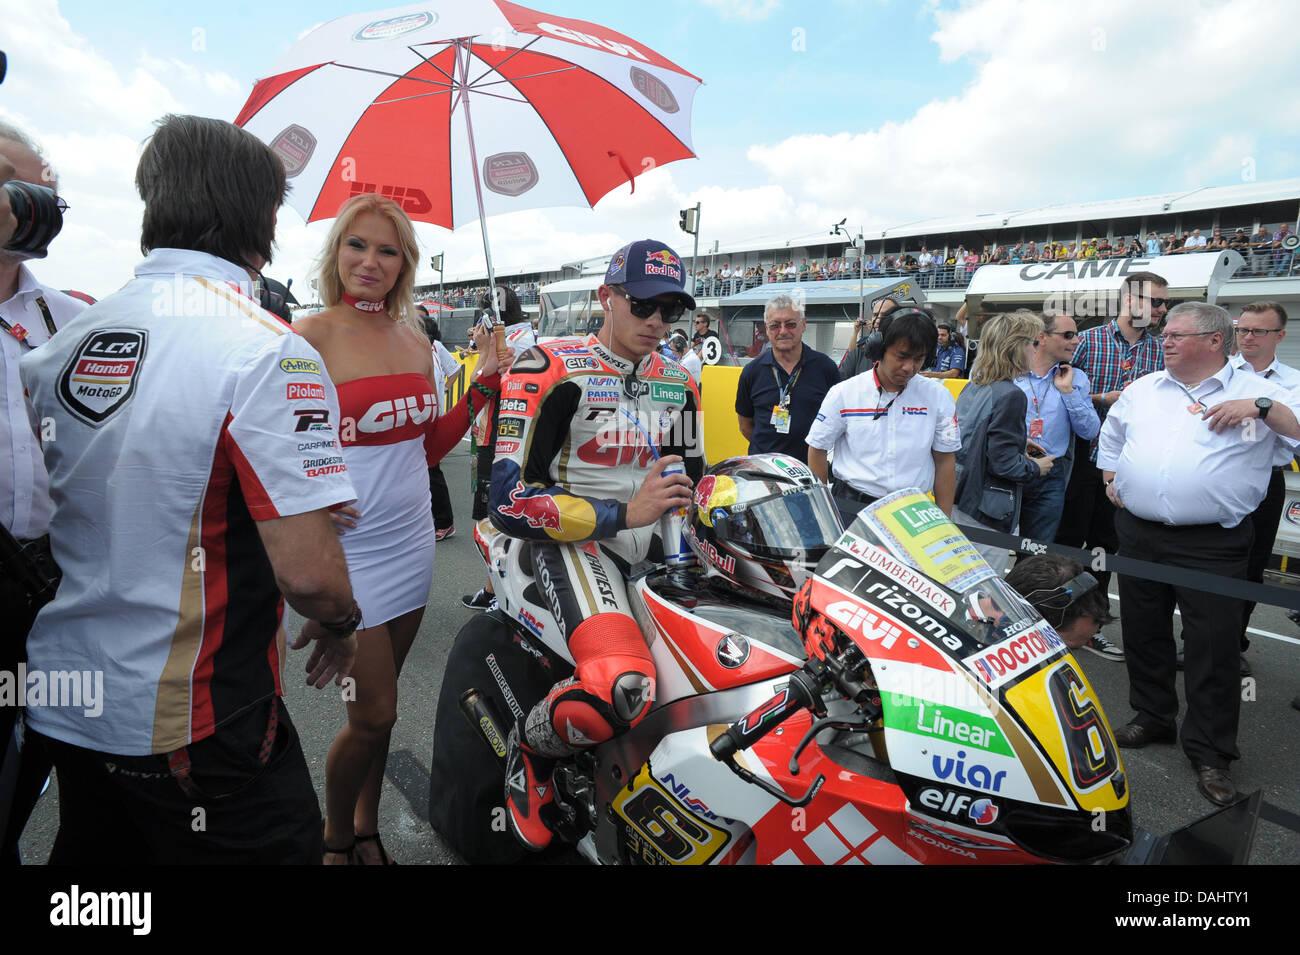 Circuito Sachsenring : El circuito de sachsenring en anécdotas